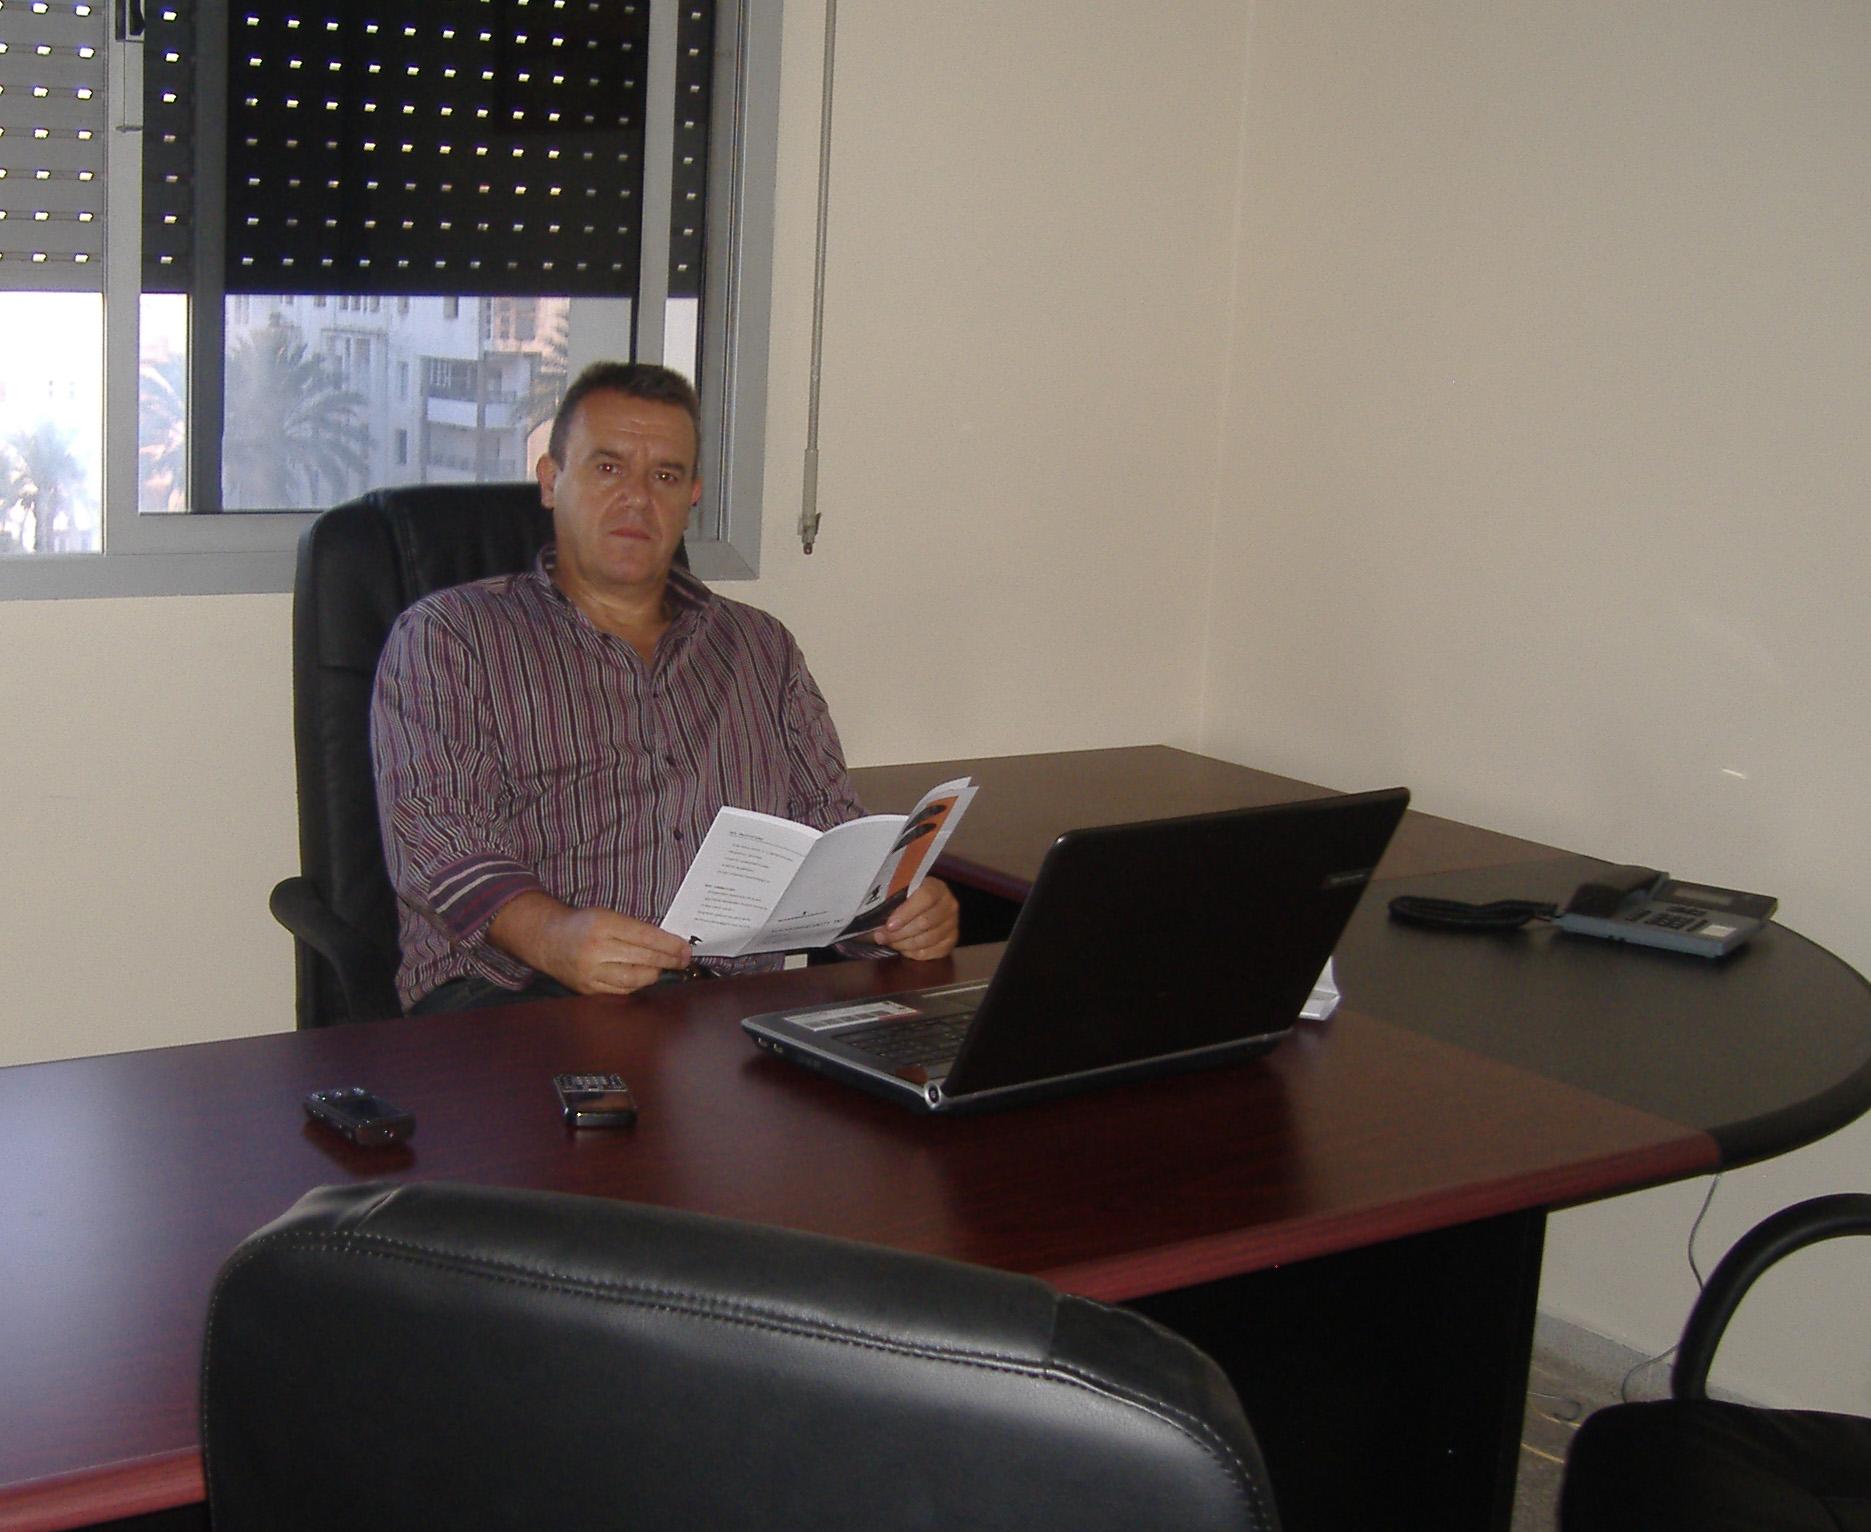 mobilier de bureau au maroc mobilier de bureau casablanca souk ma mobilier de bureau. Black Bedroom Furniture Sets. Home Design Ideas